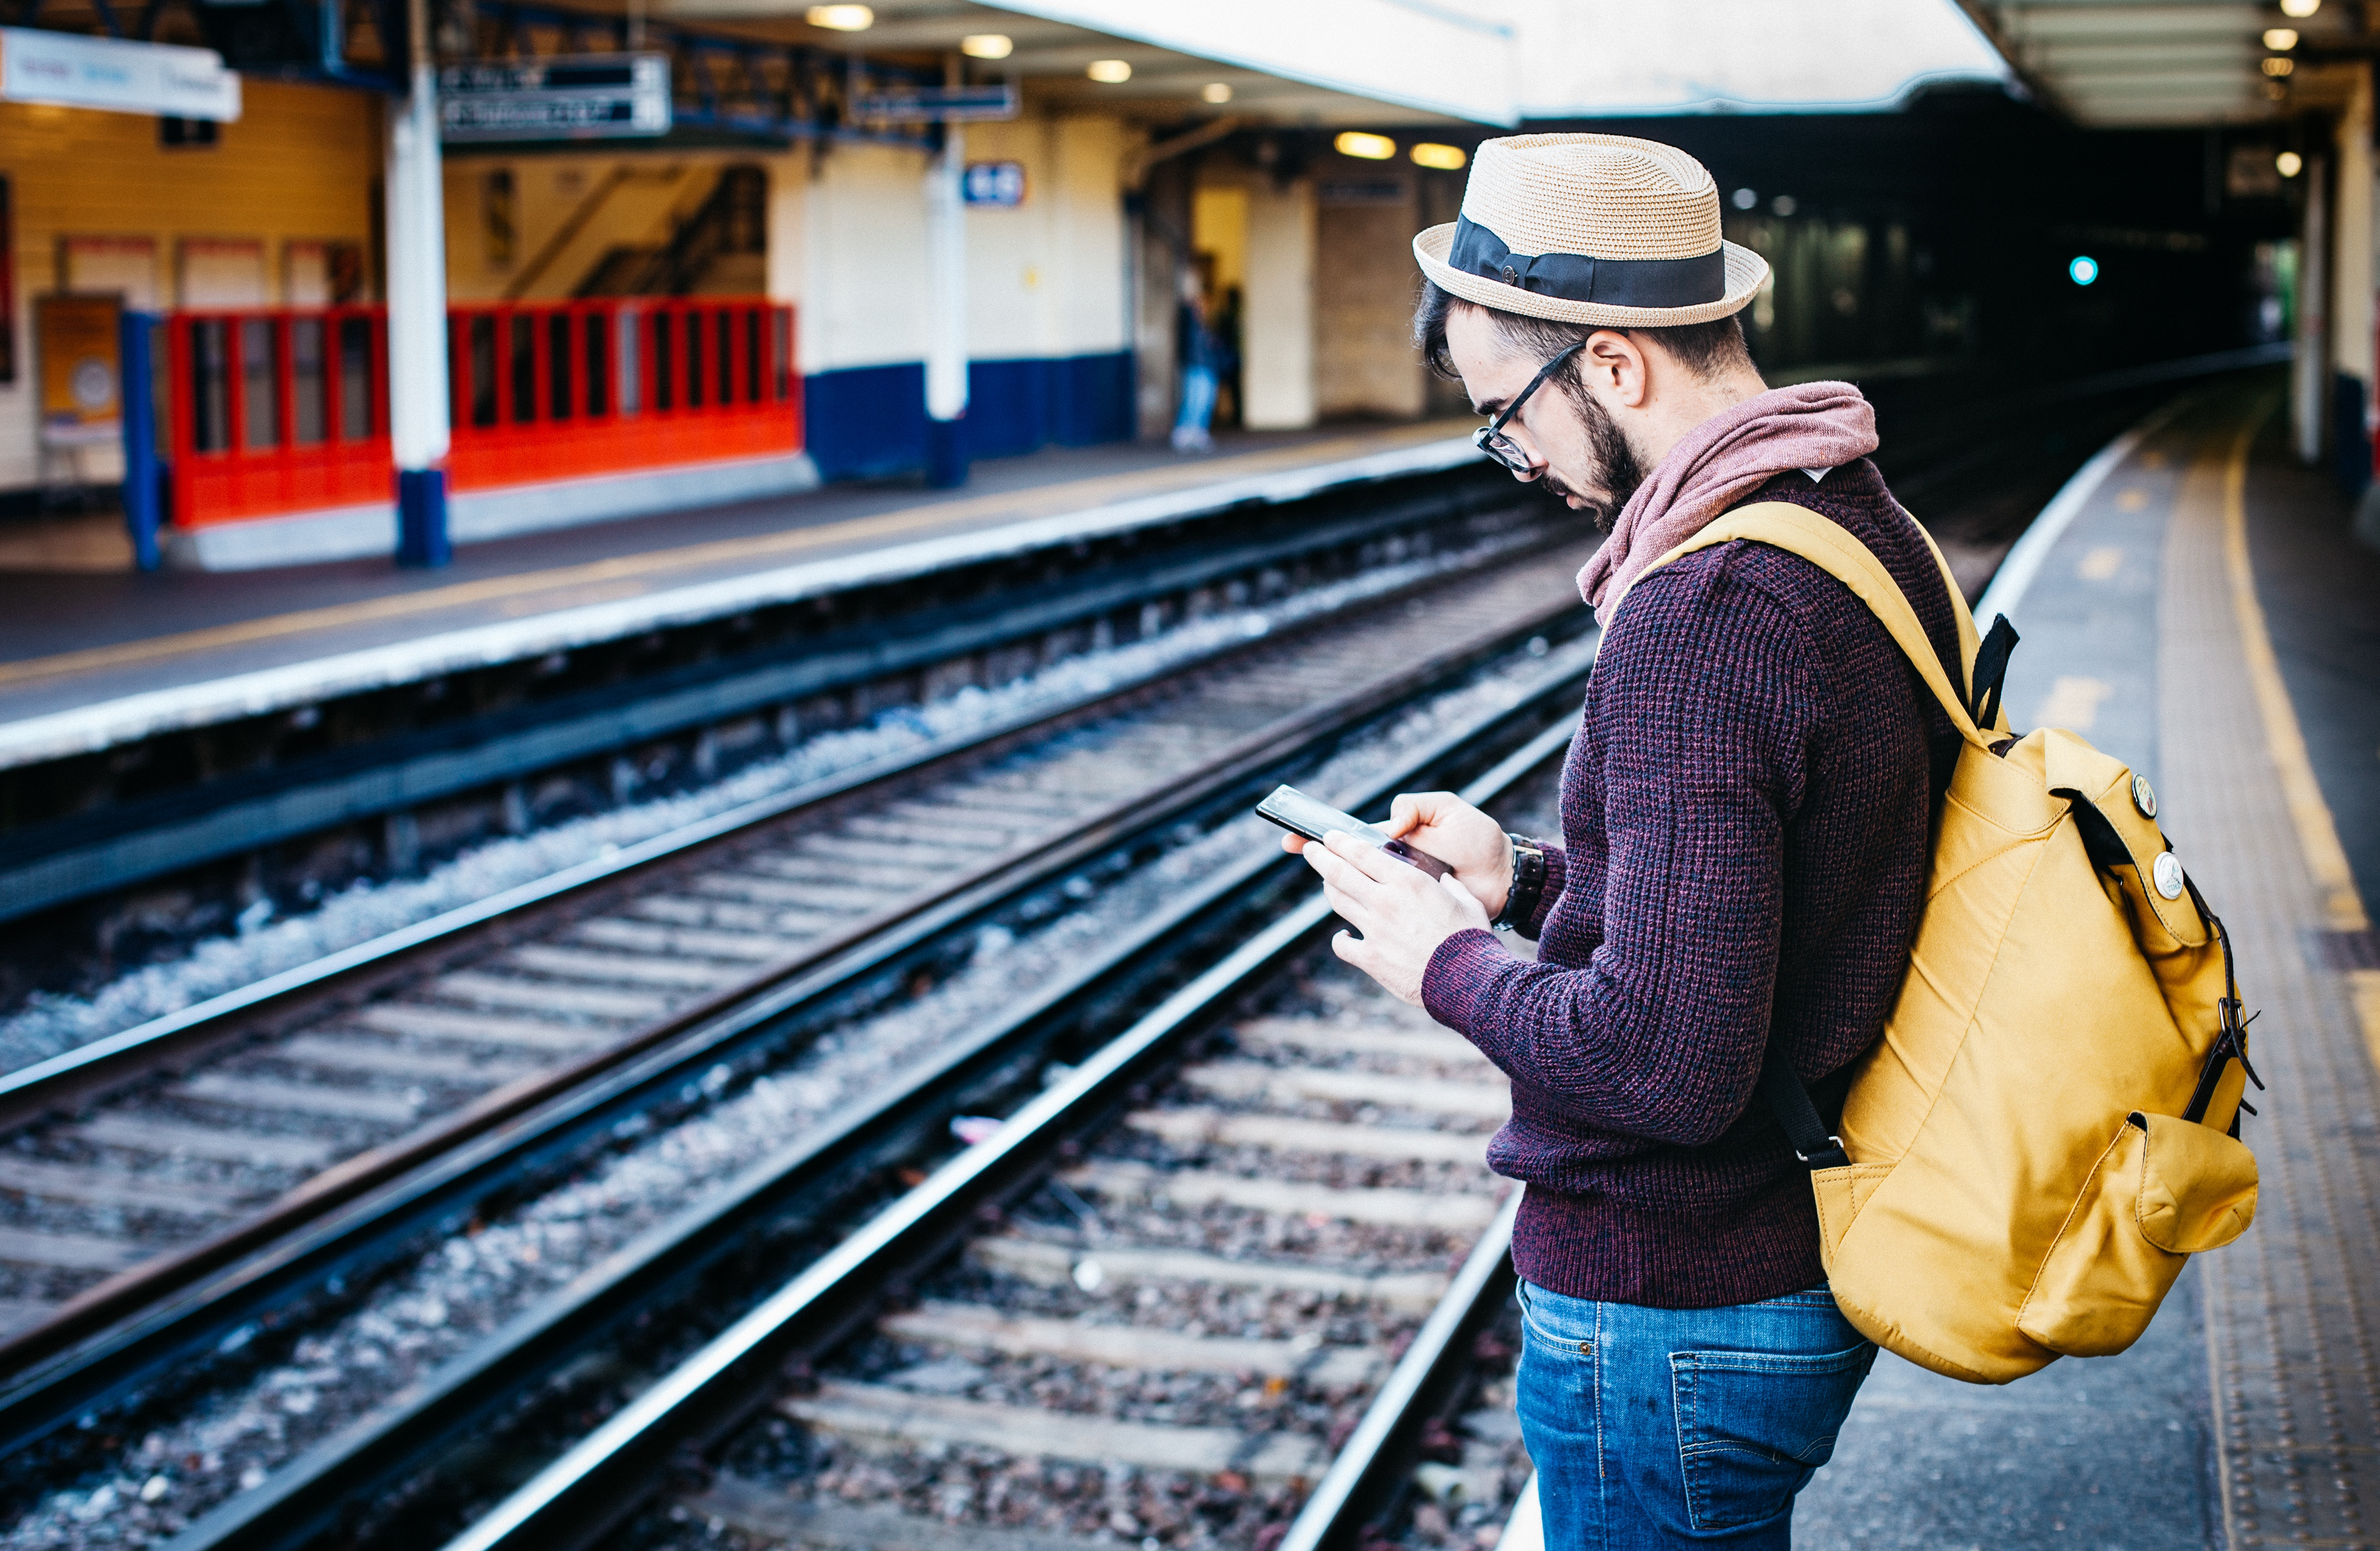 FAQ | Can I Use A Sprint Phone on Verizon's Network?